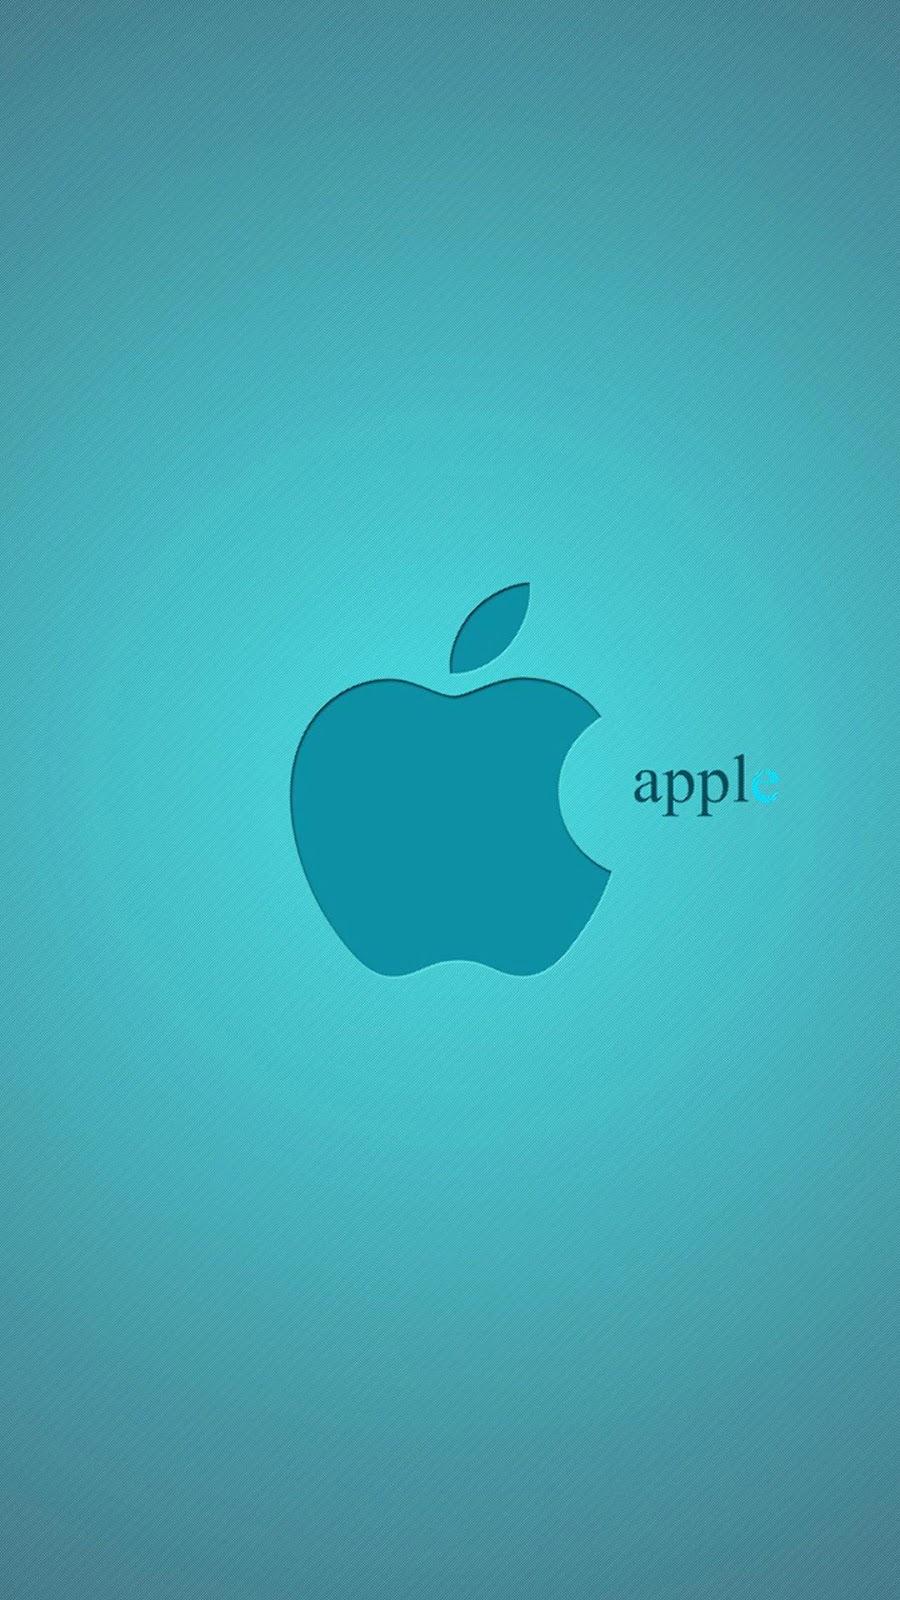 Apple Light Blue Logo iPhone 7 and iPhone 7 Plus Wallpaper   HD 900x1600